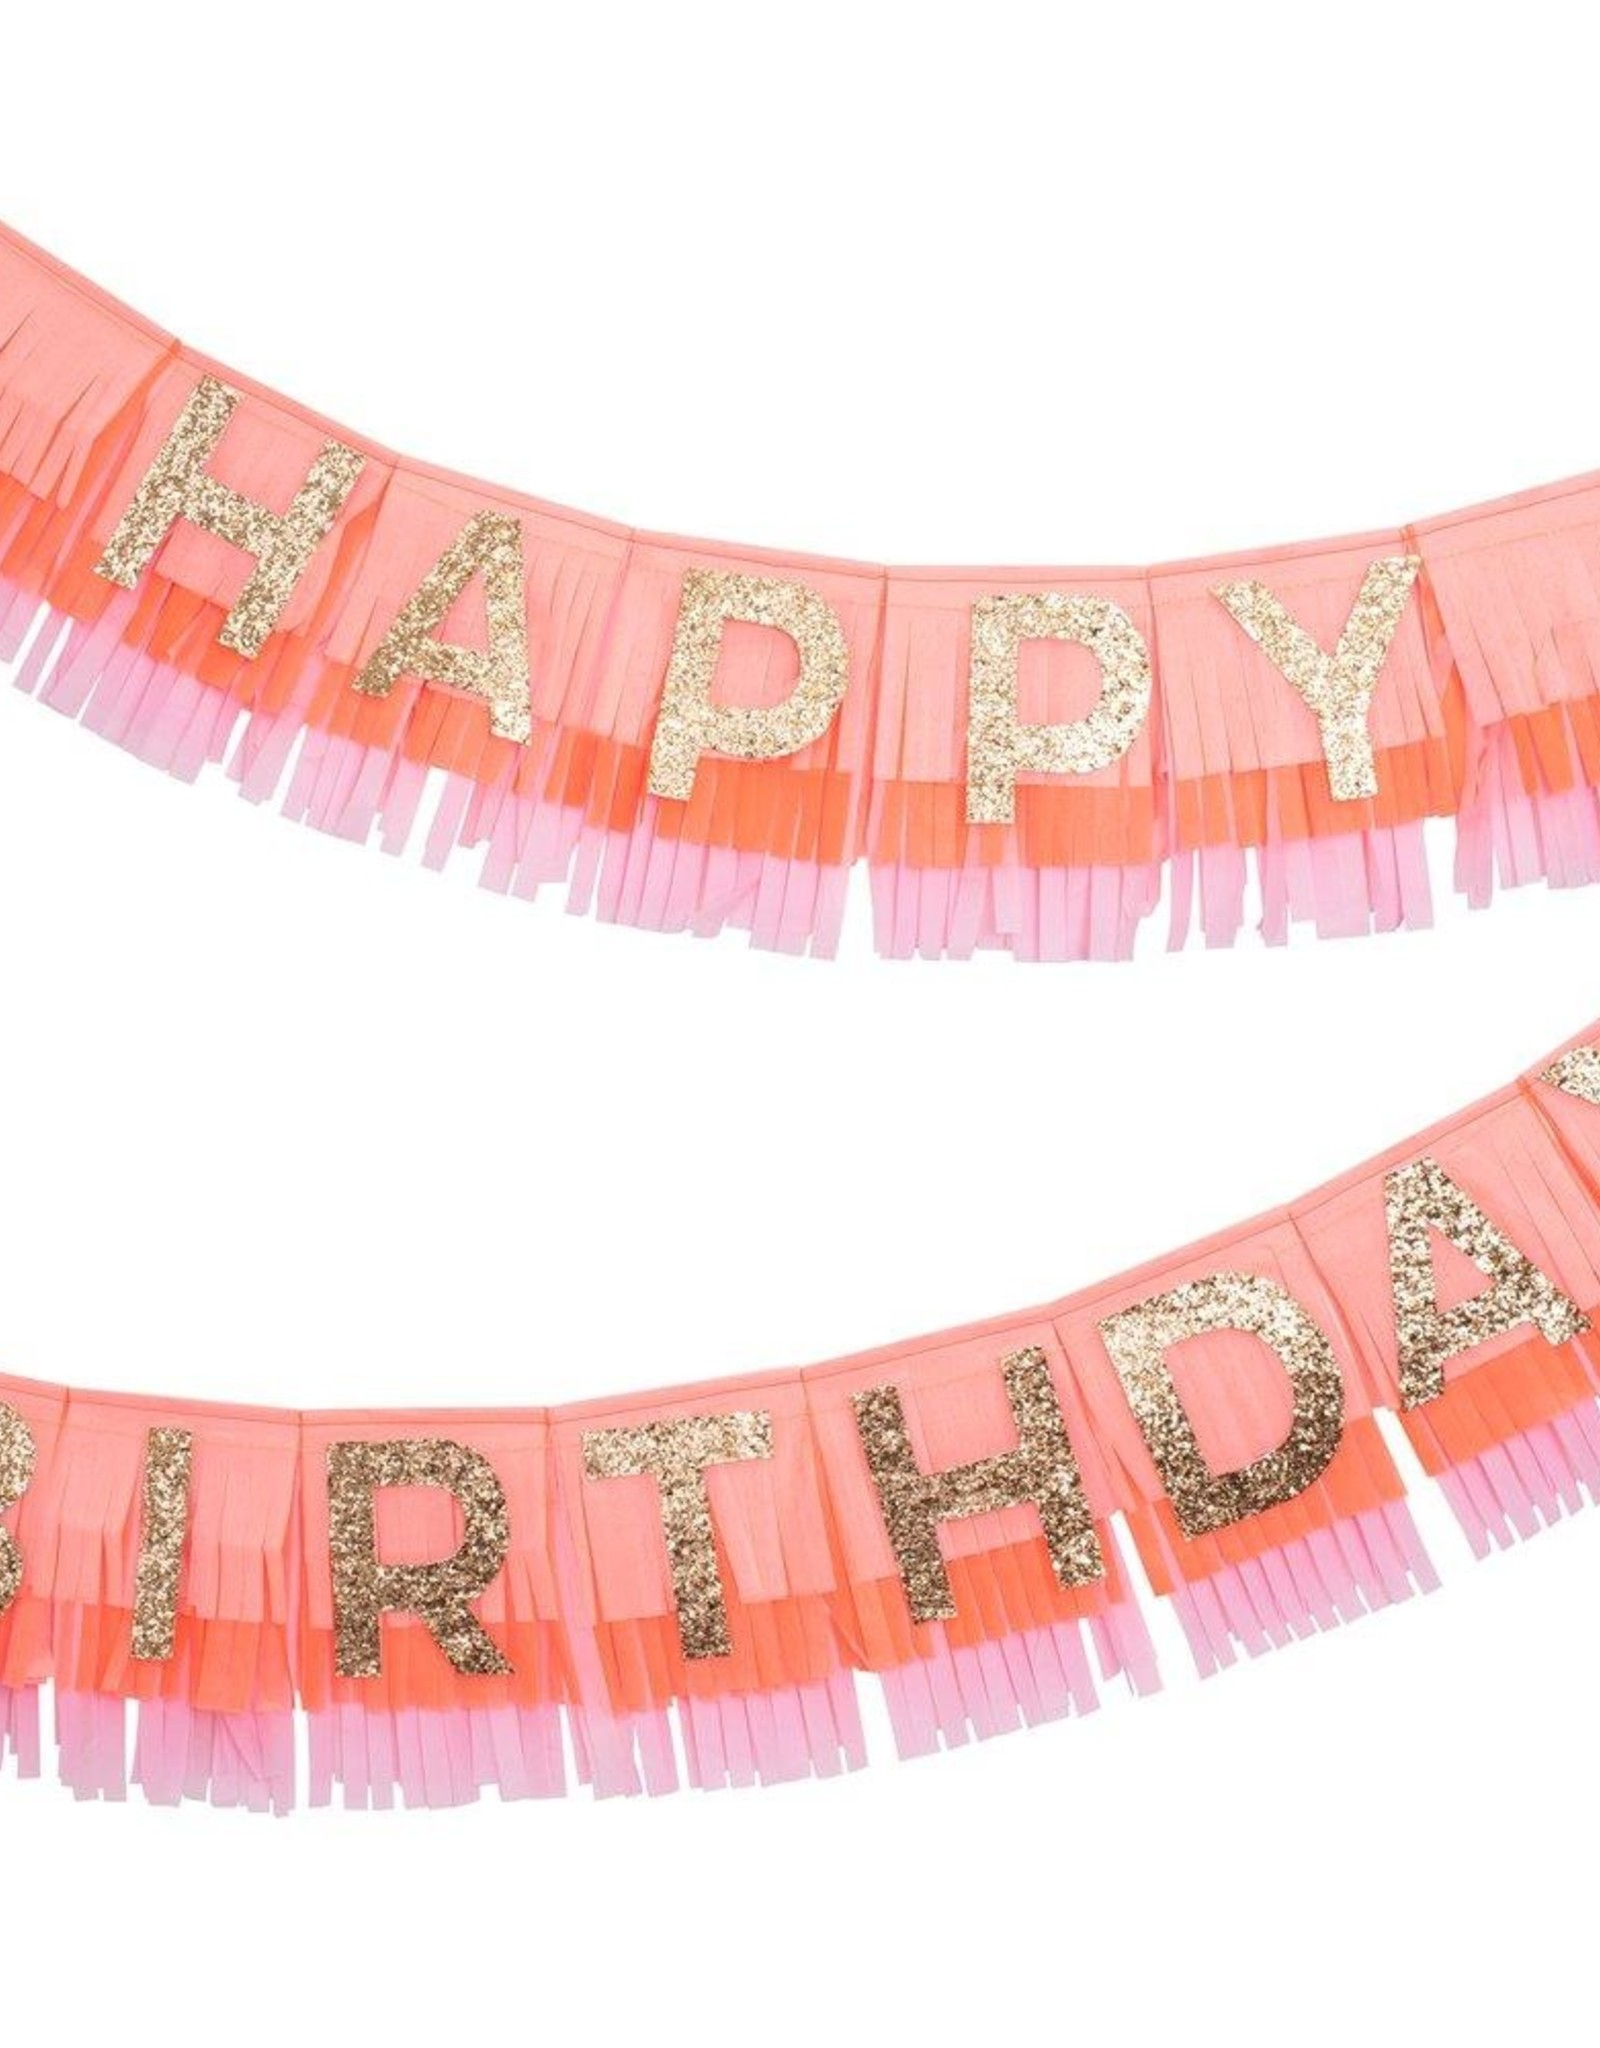 Meri Meri pink happy birthday garland